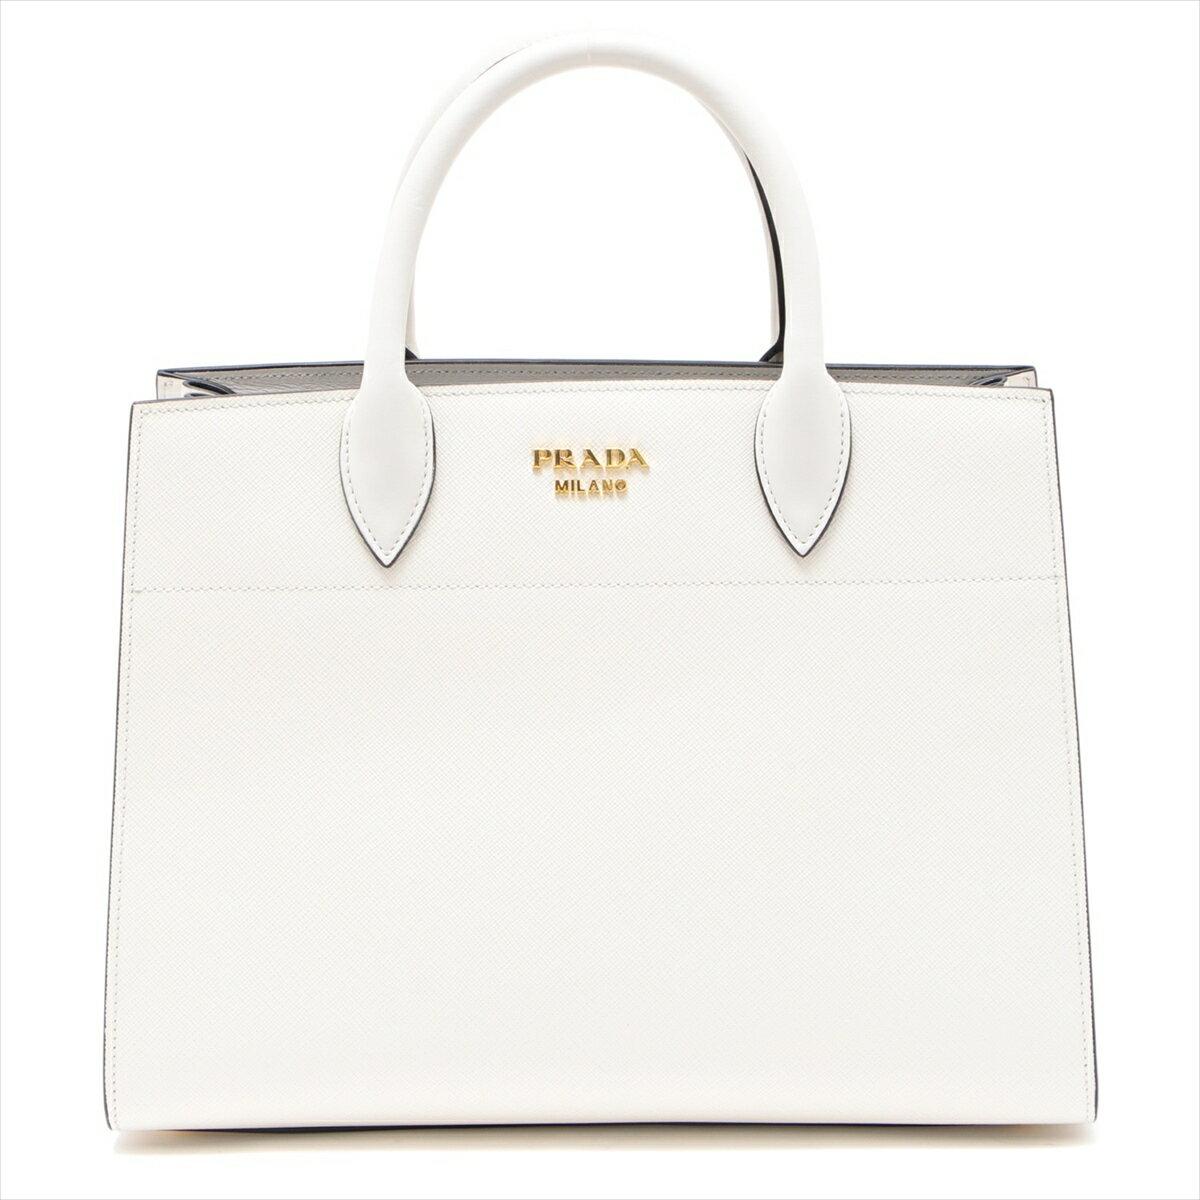 [Used] Prada Bibliotheque Saffiano 2WAY Handbag White 1BA049